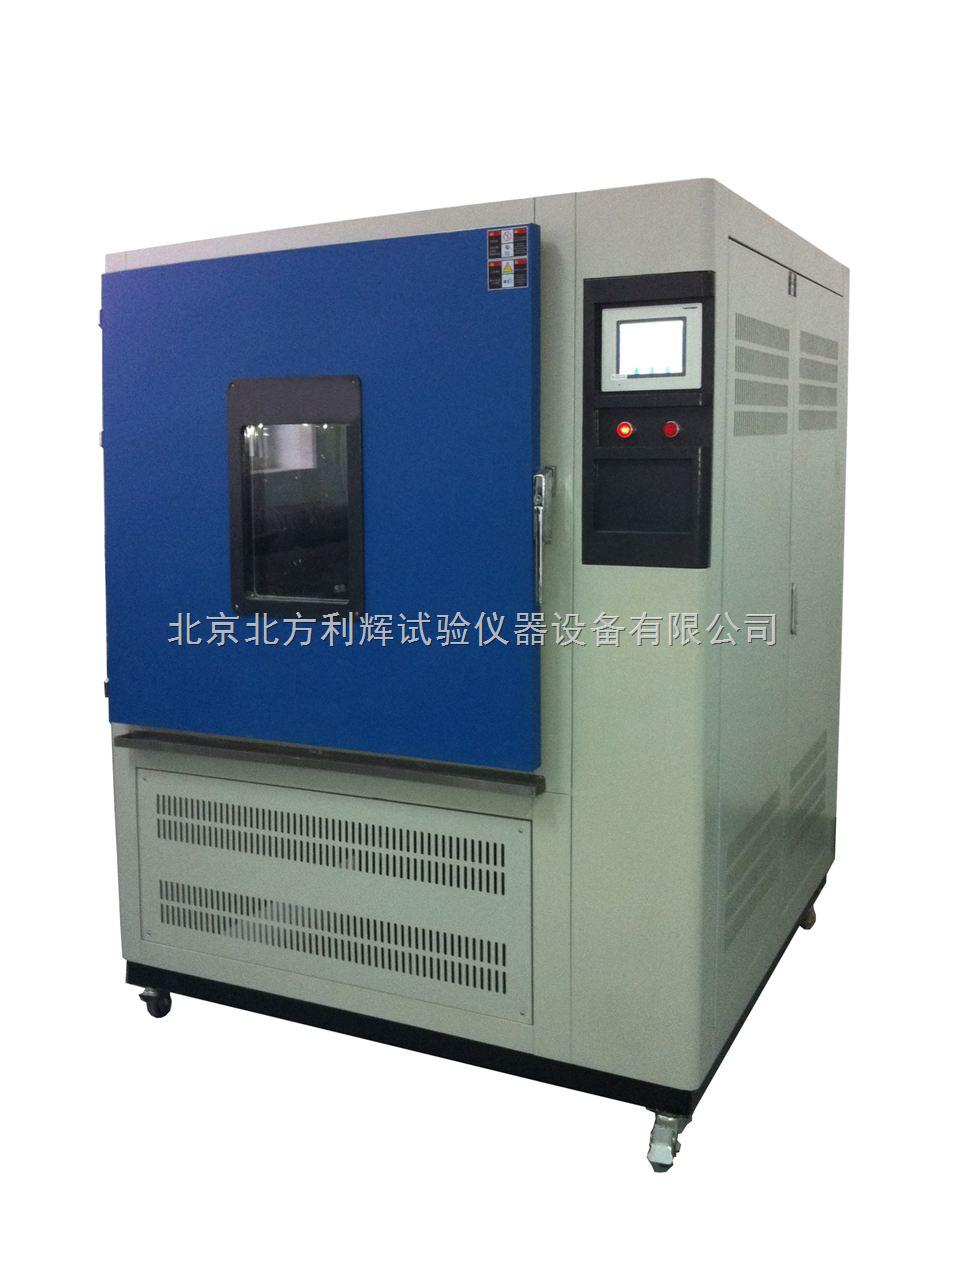 QL-100臭氧老化试验箱+北京